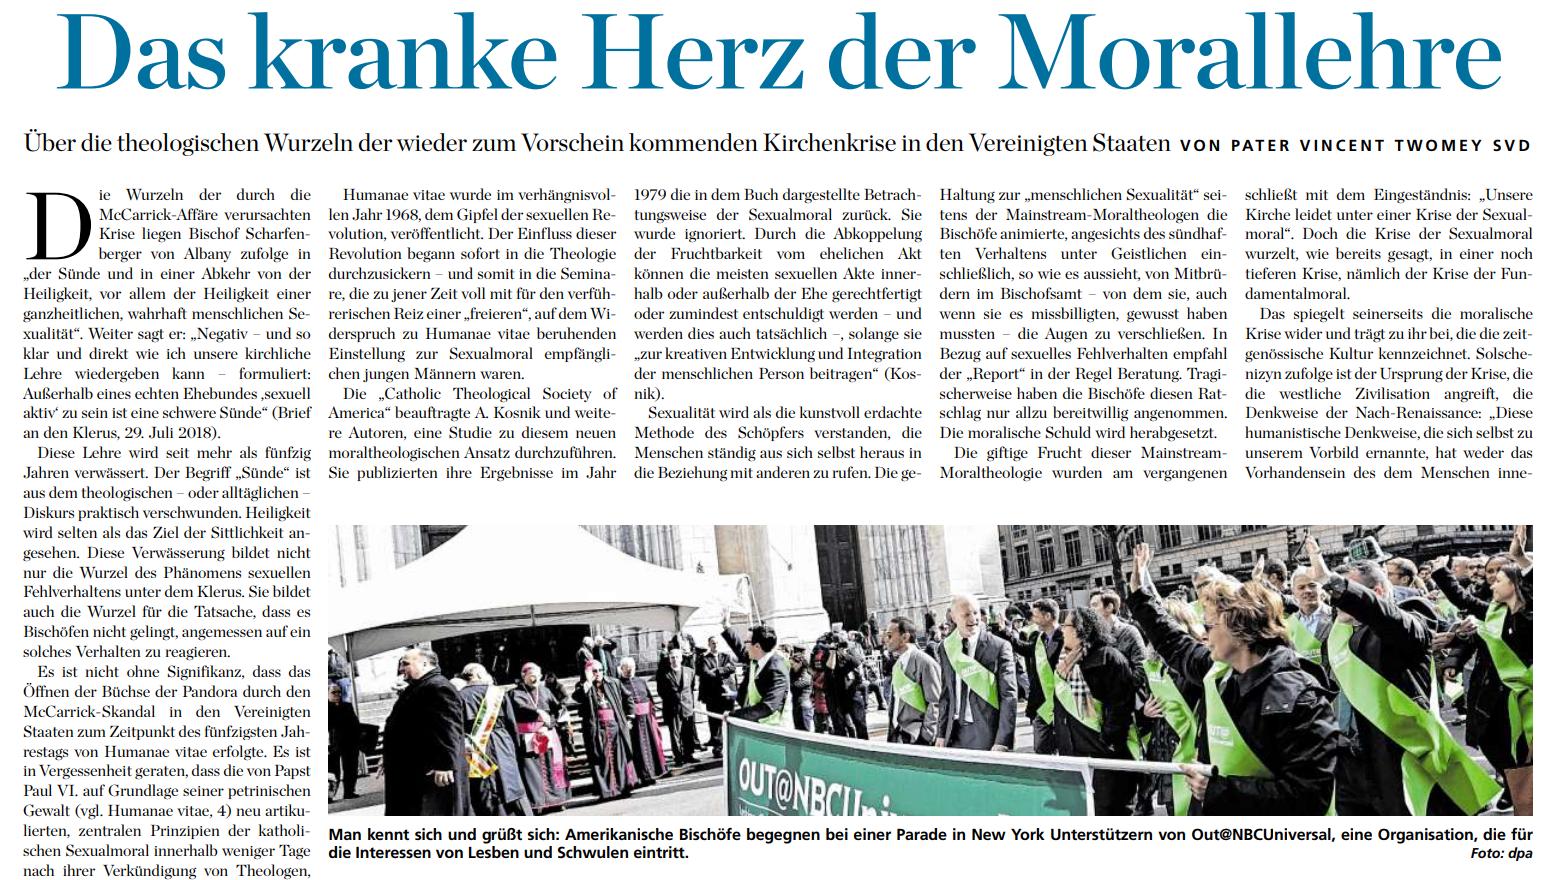 http://www.die-tagespost.de